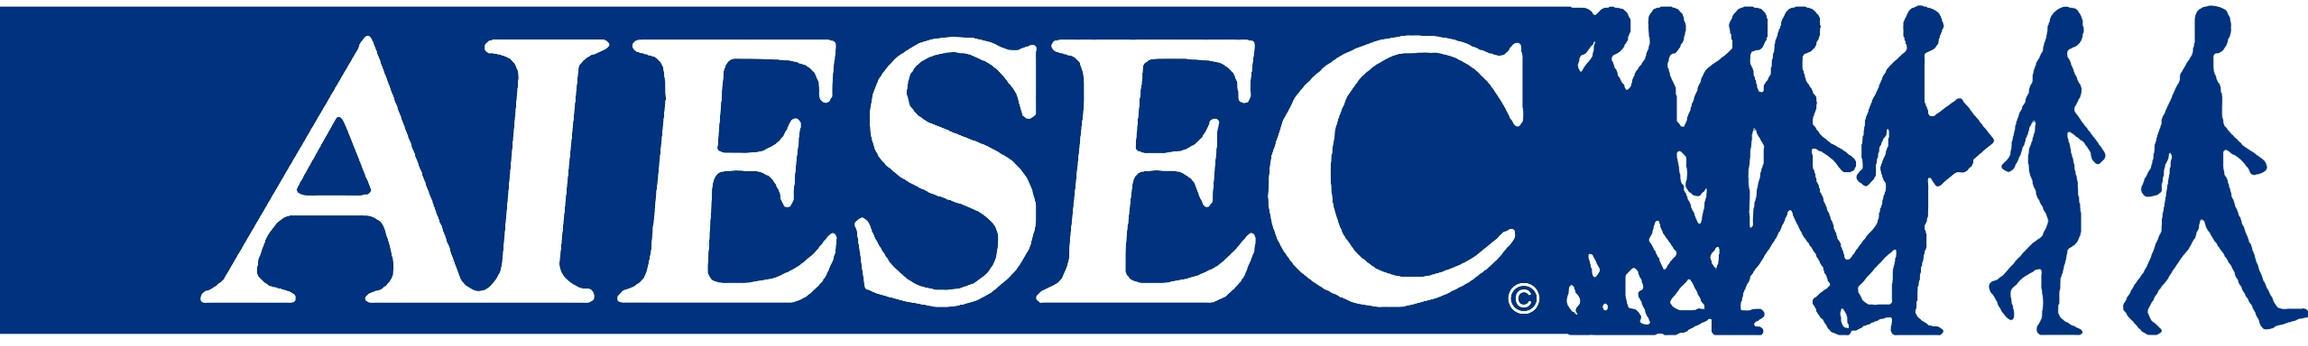 Aiesec logo by aiesec medina on deviantart